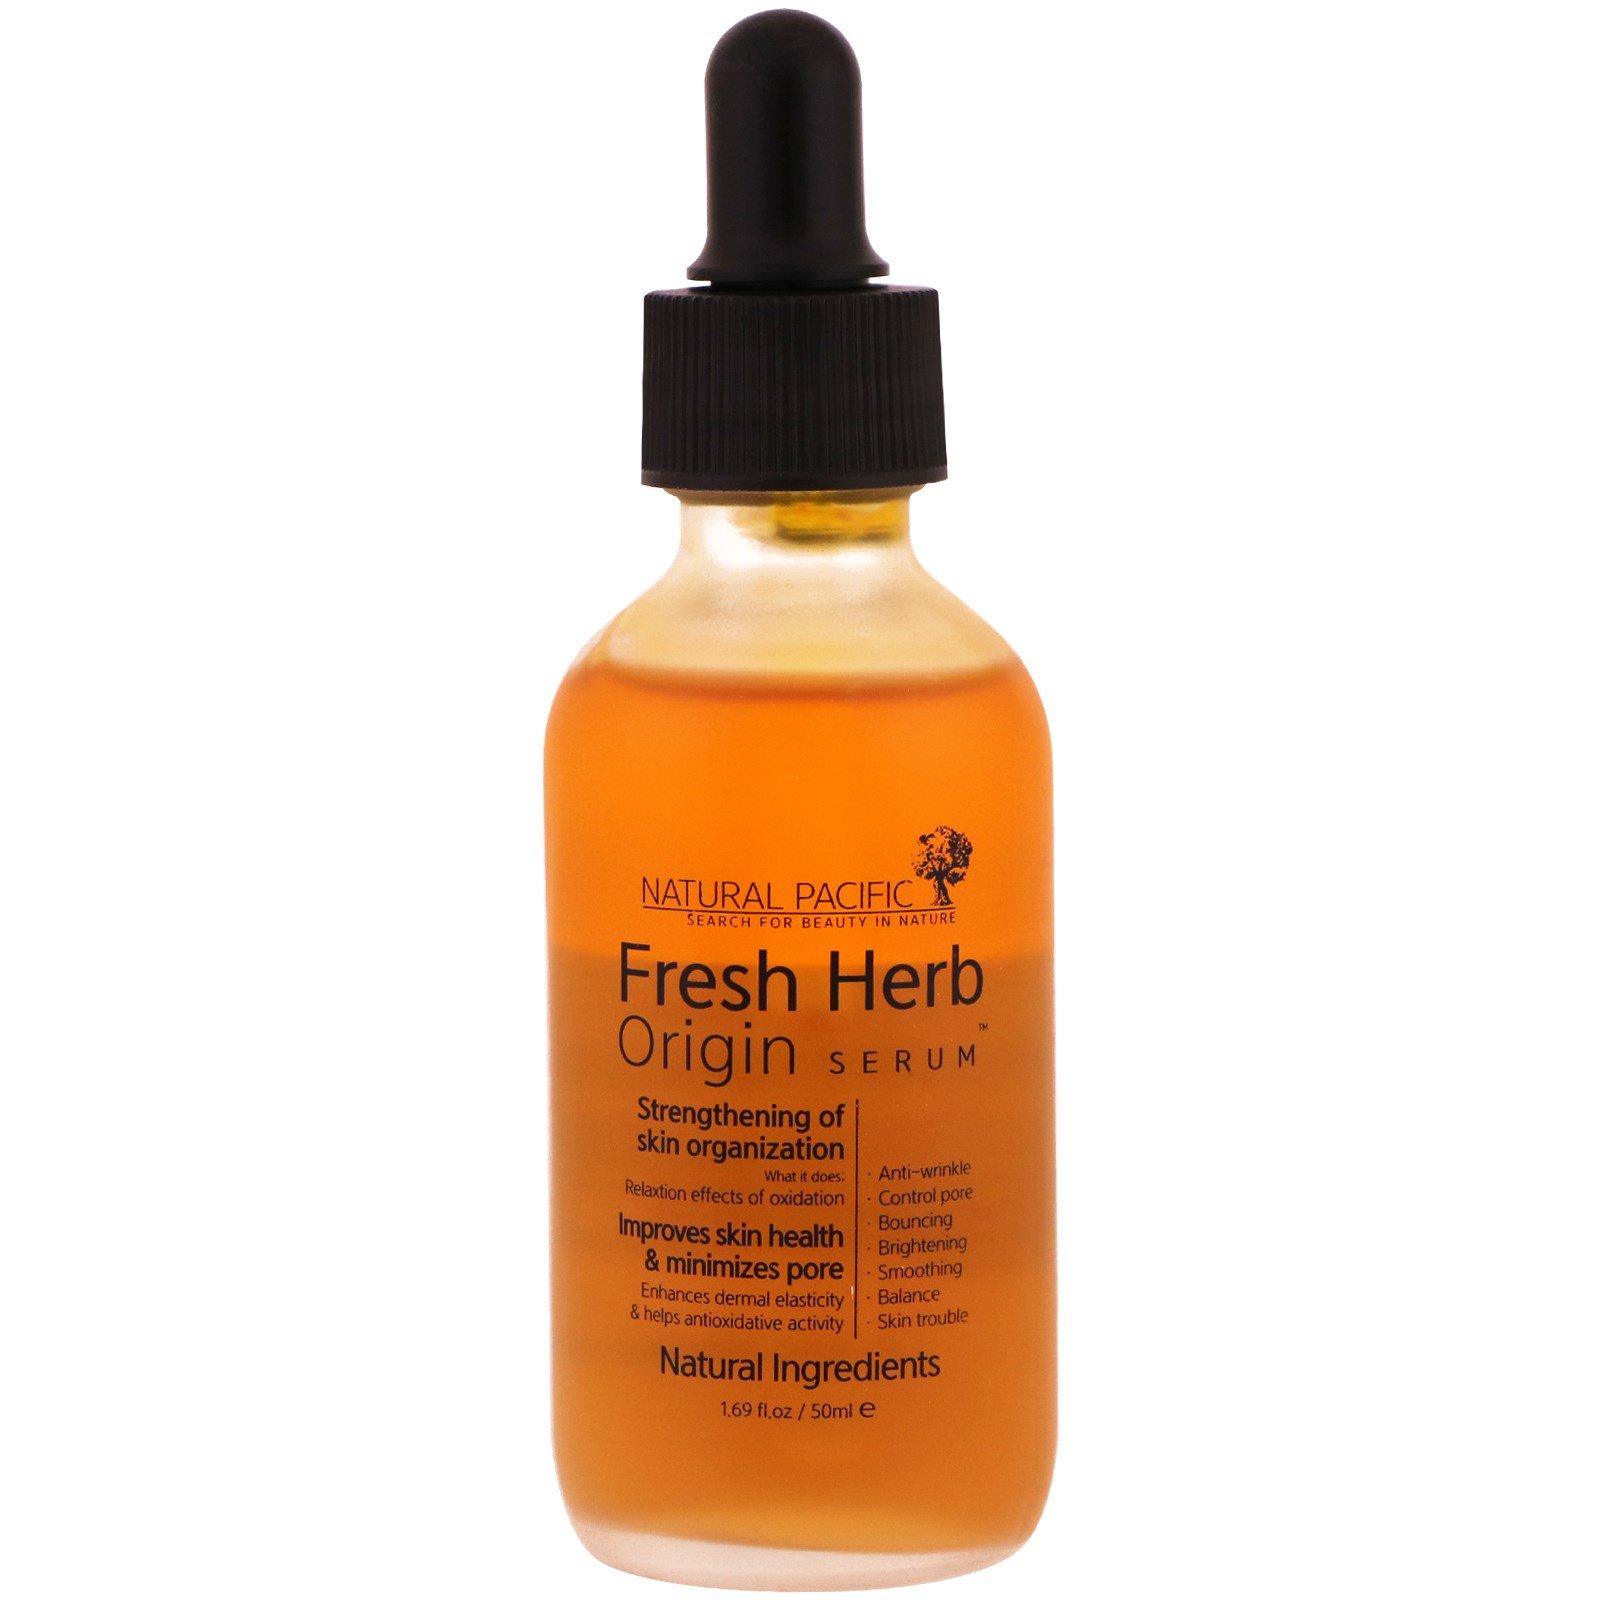 Natural Pacific, Fresh Herb, Origin Serum, 1.69 fl oz (50 ml)